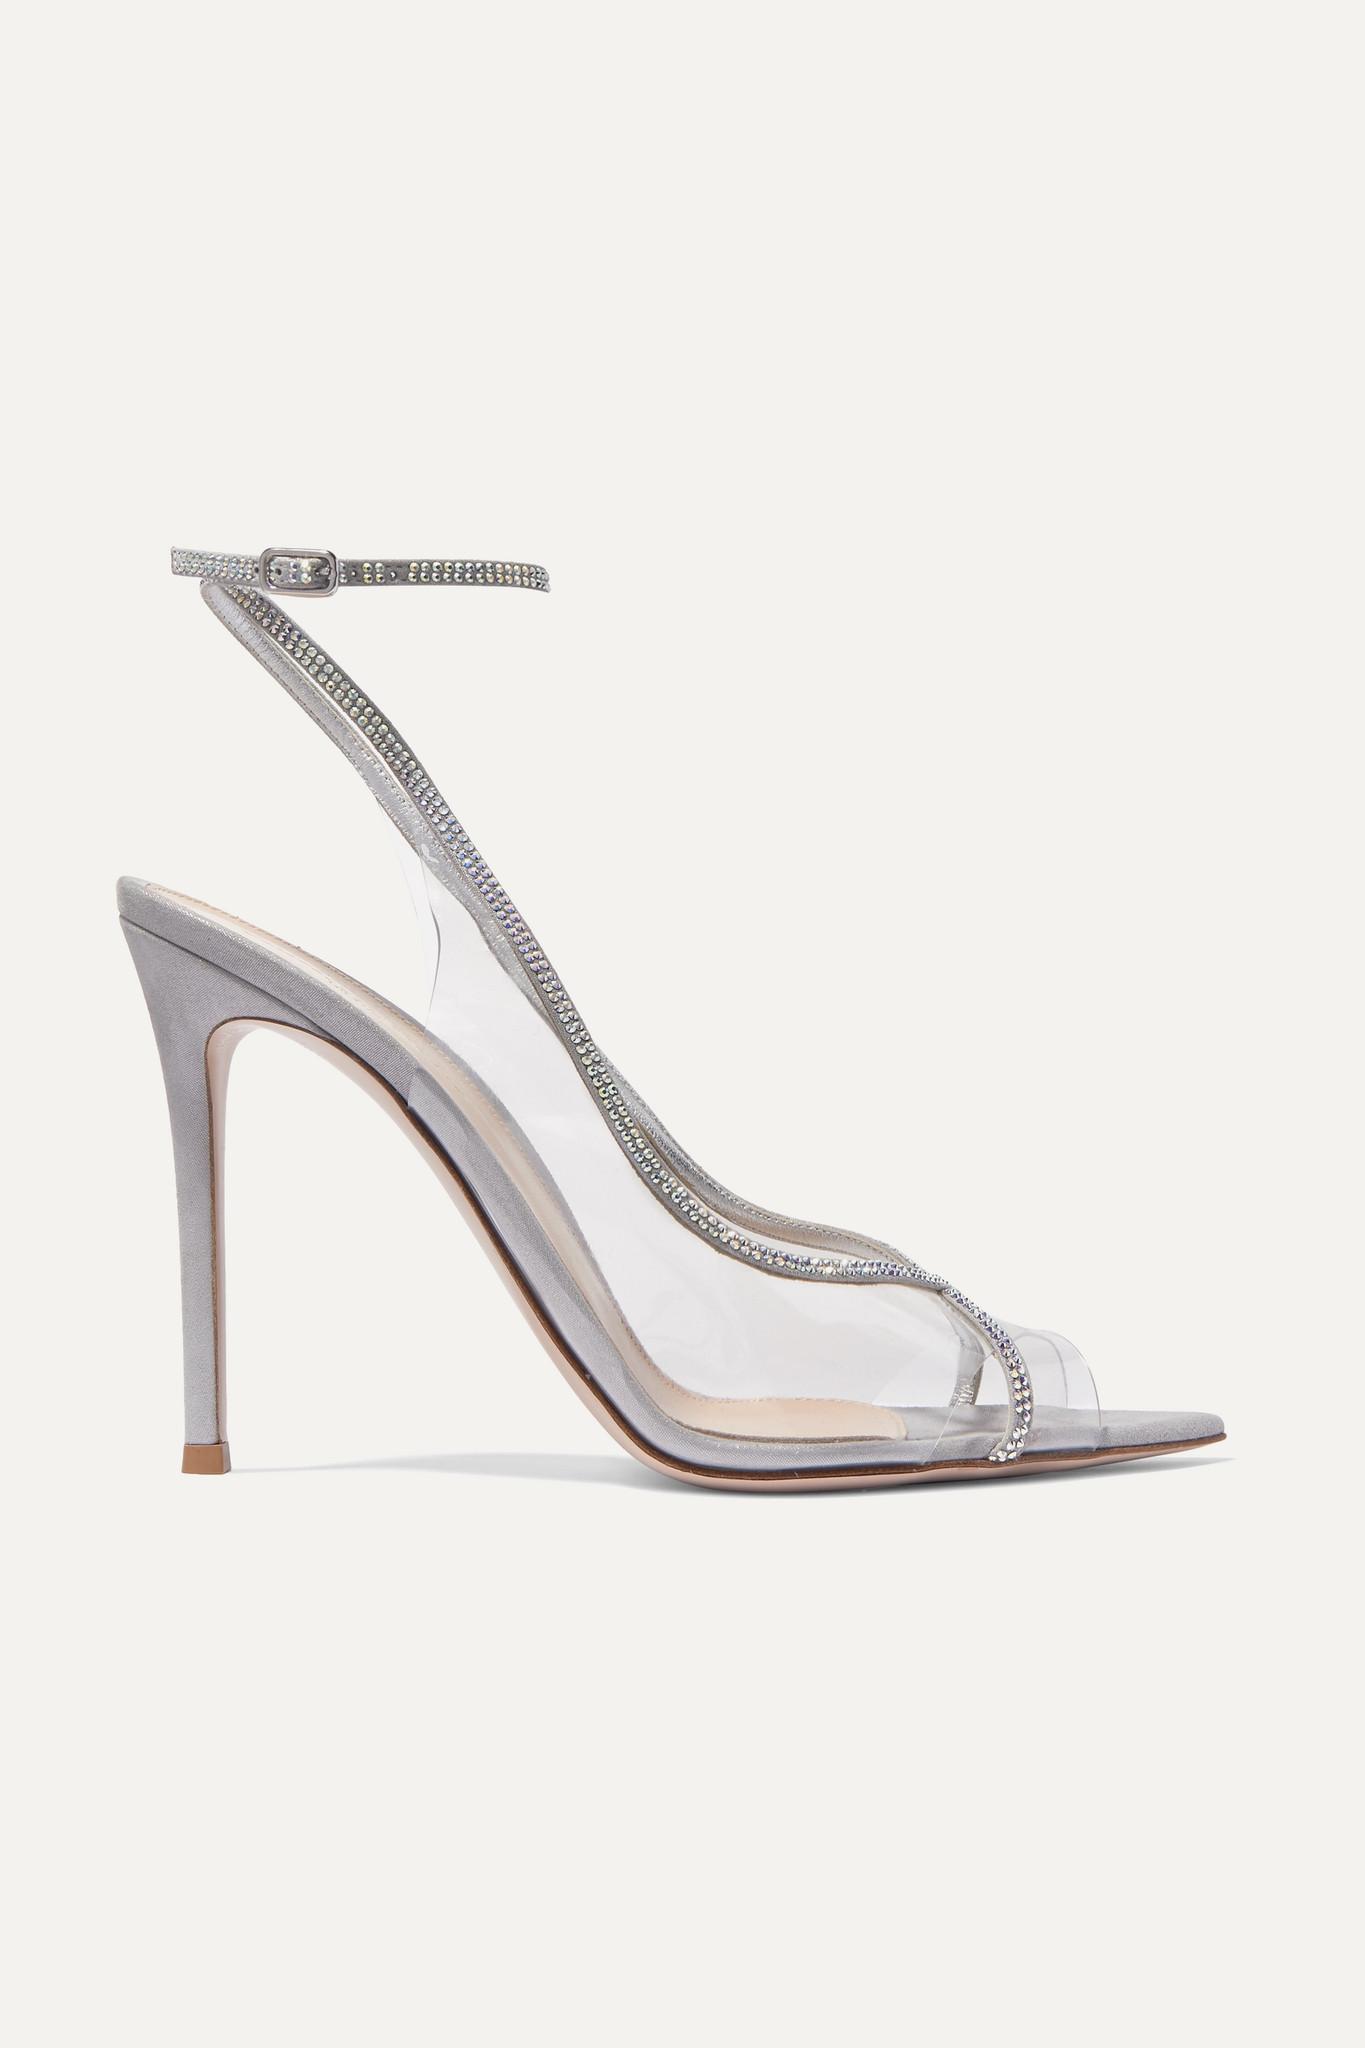 GIANVITO ROSSI - Plexi 105 水晶缀饰金属丝面料 Pvc 凉鞋 - 银色 - IT39